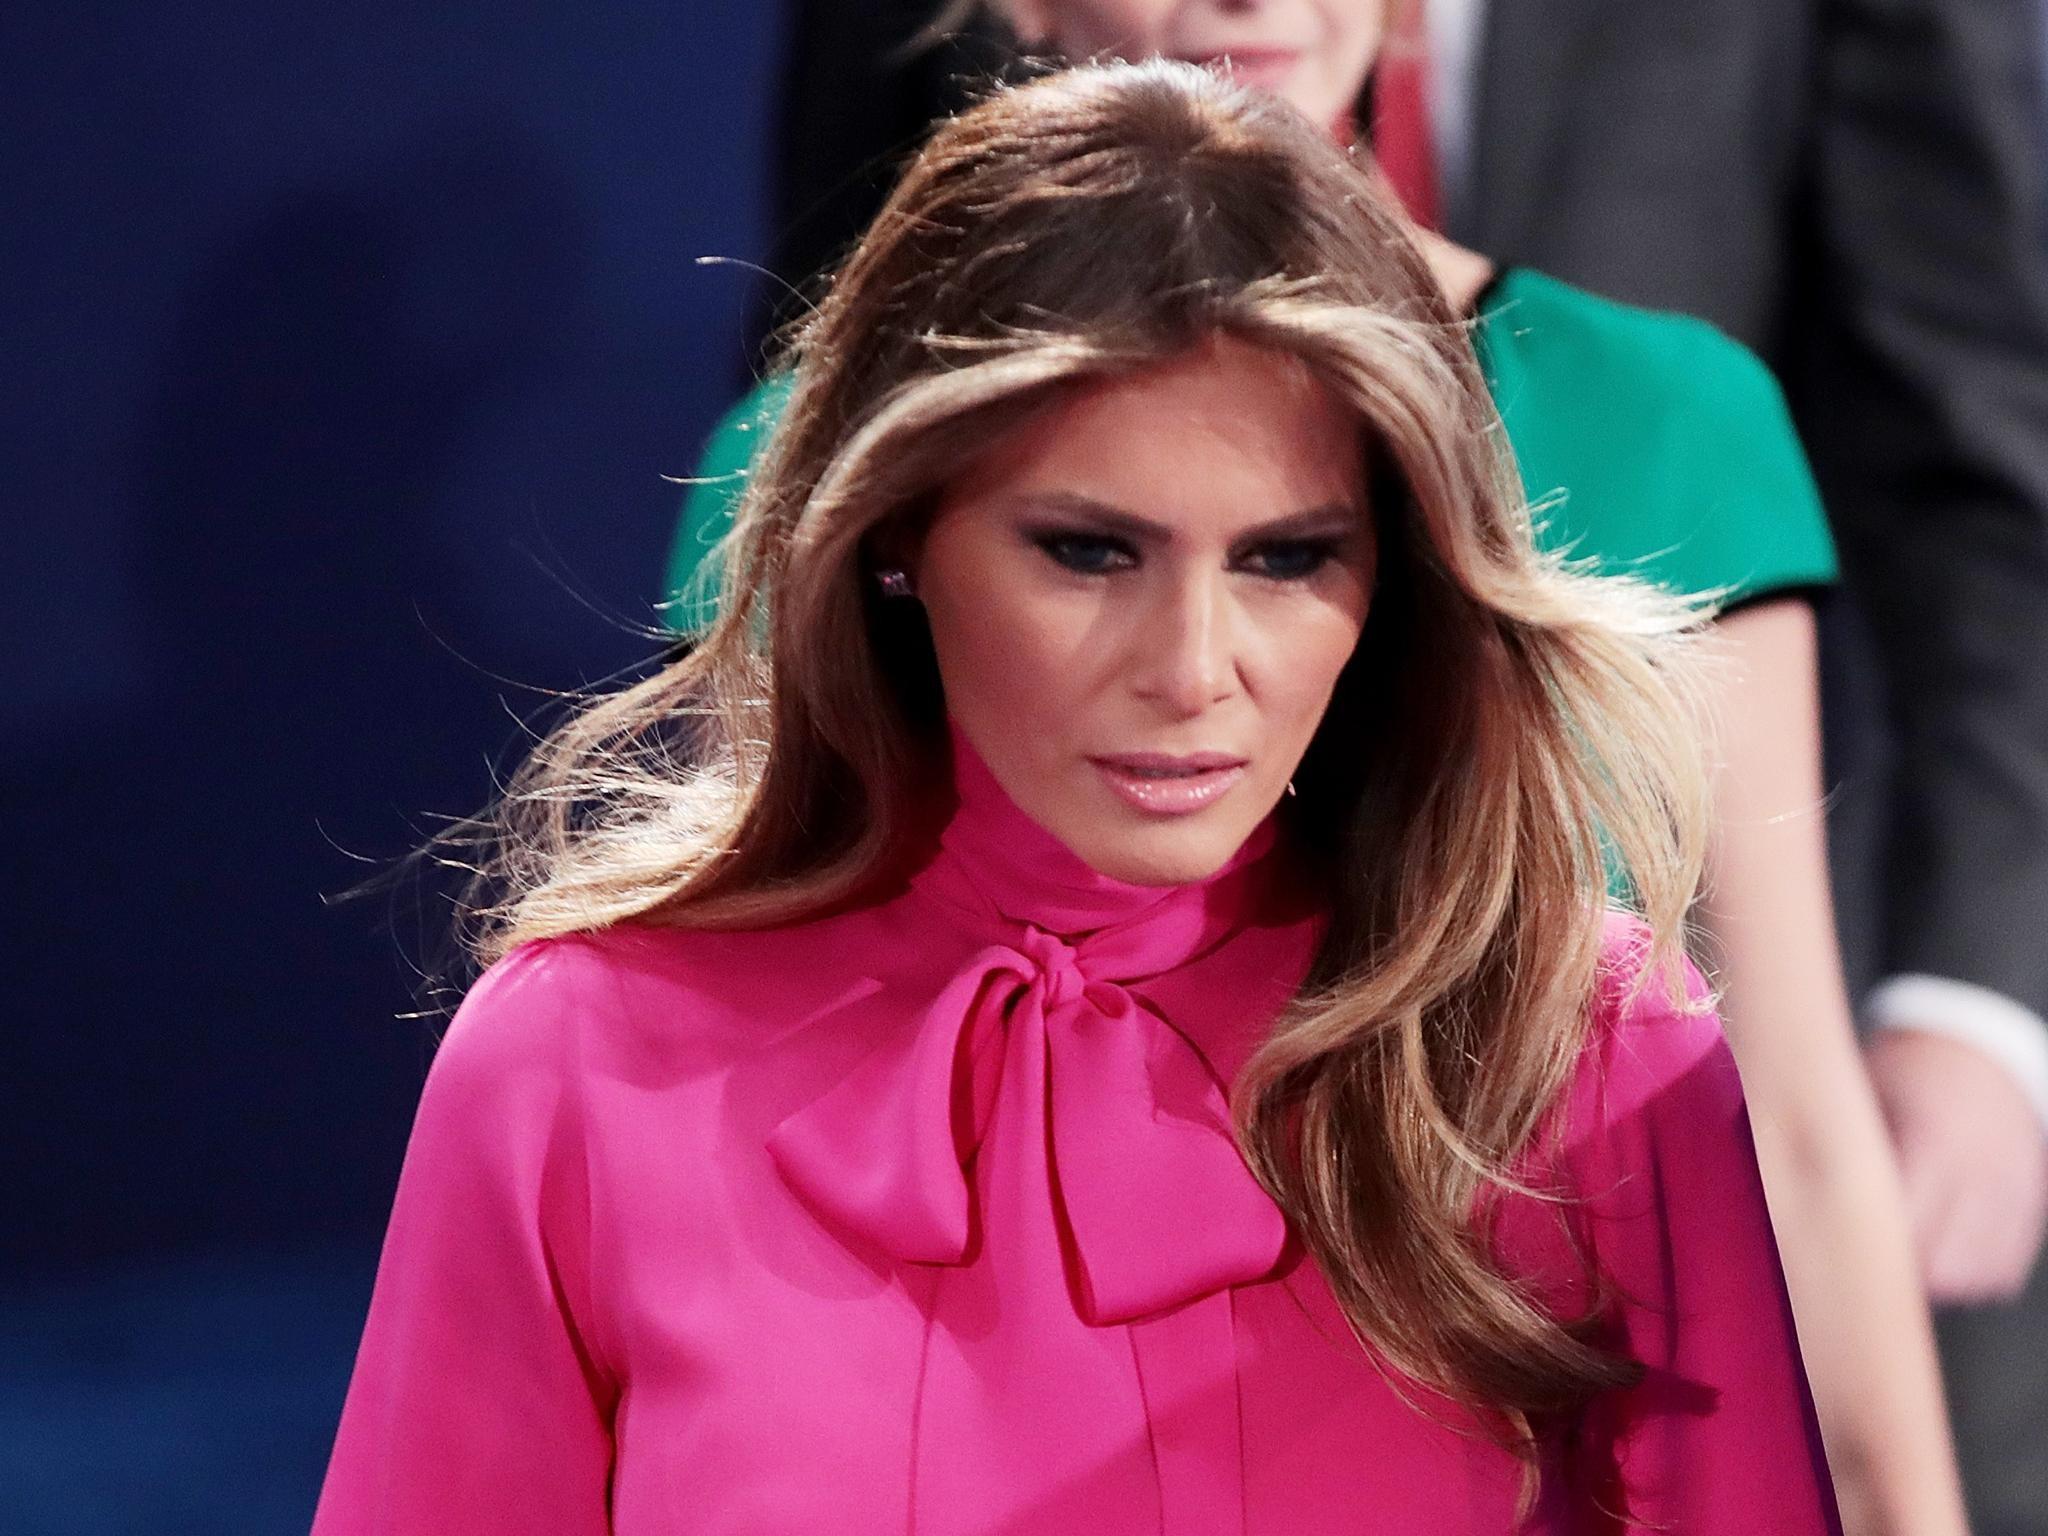 Melania Trump dismisses husband's sex assault comments as 'boys talk'